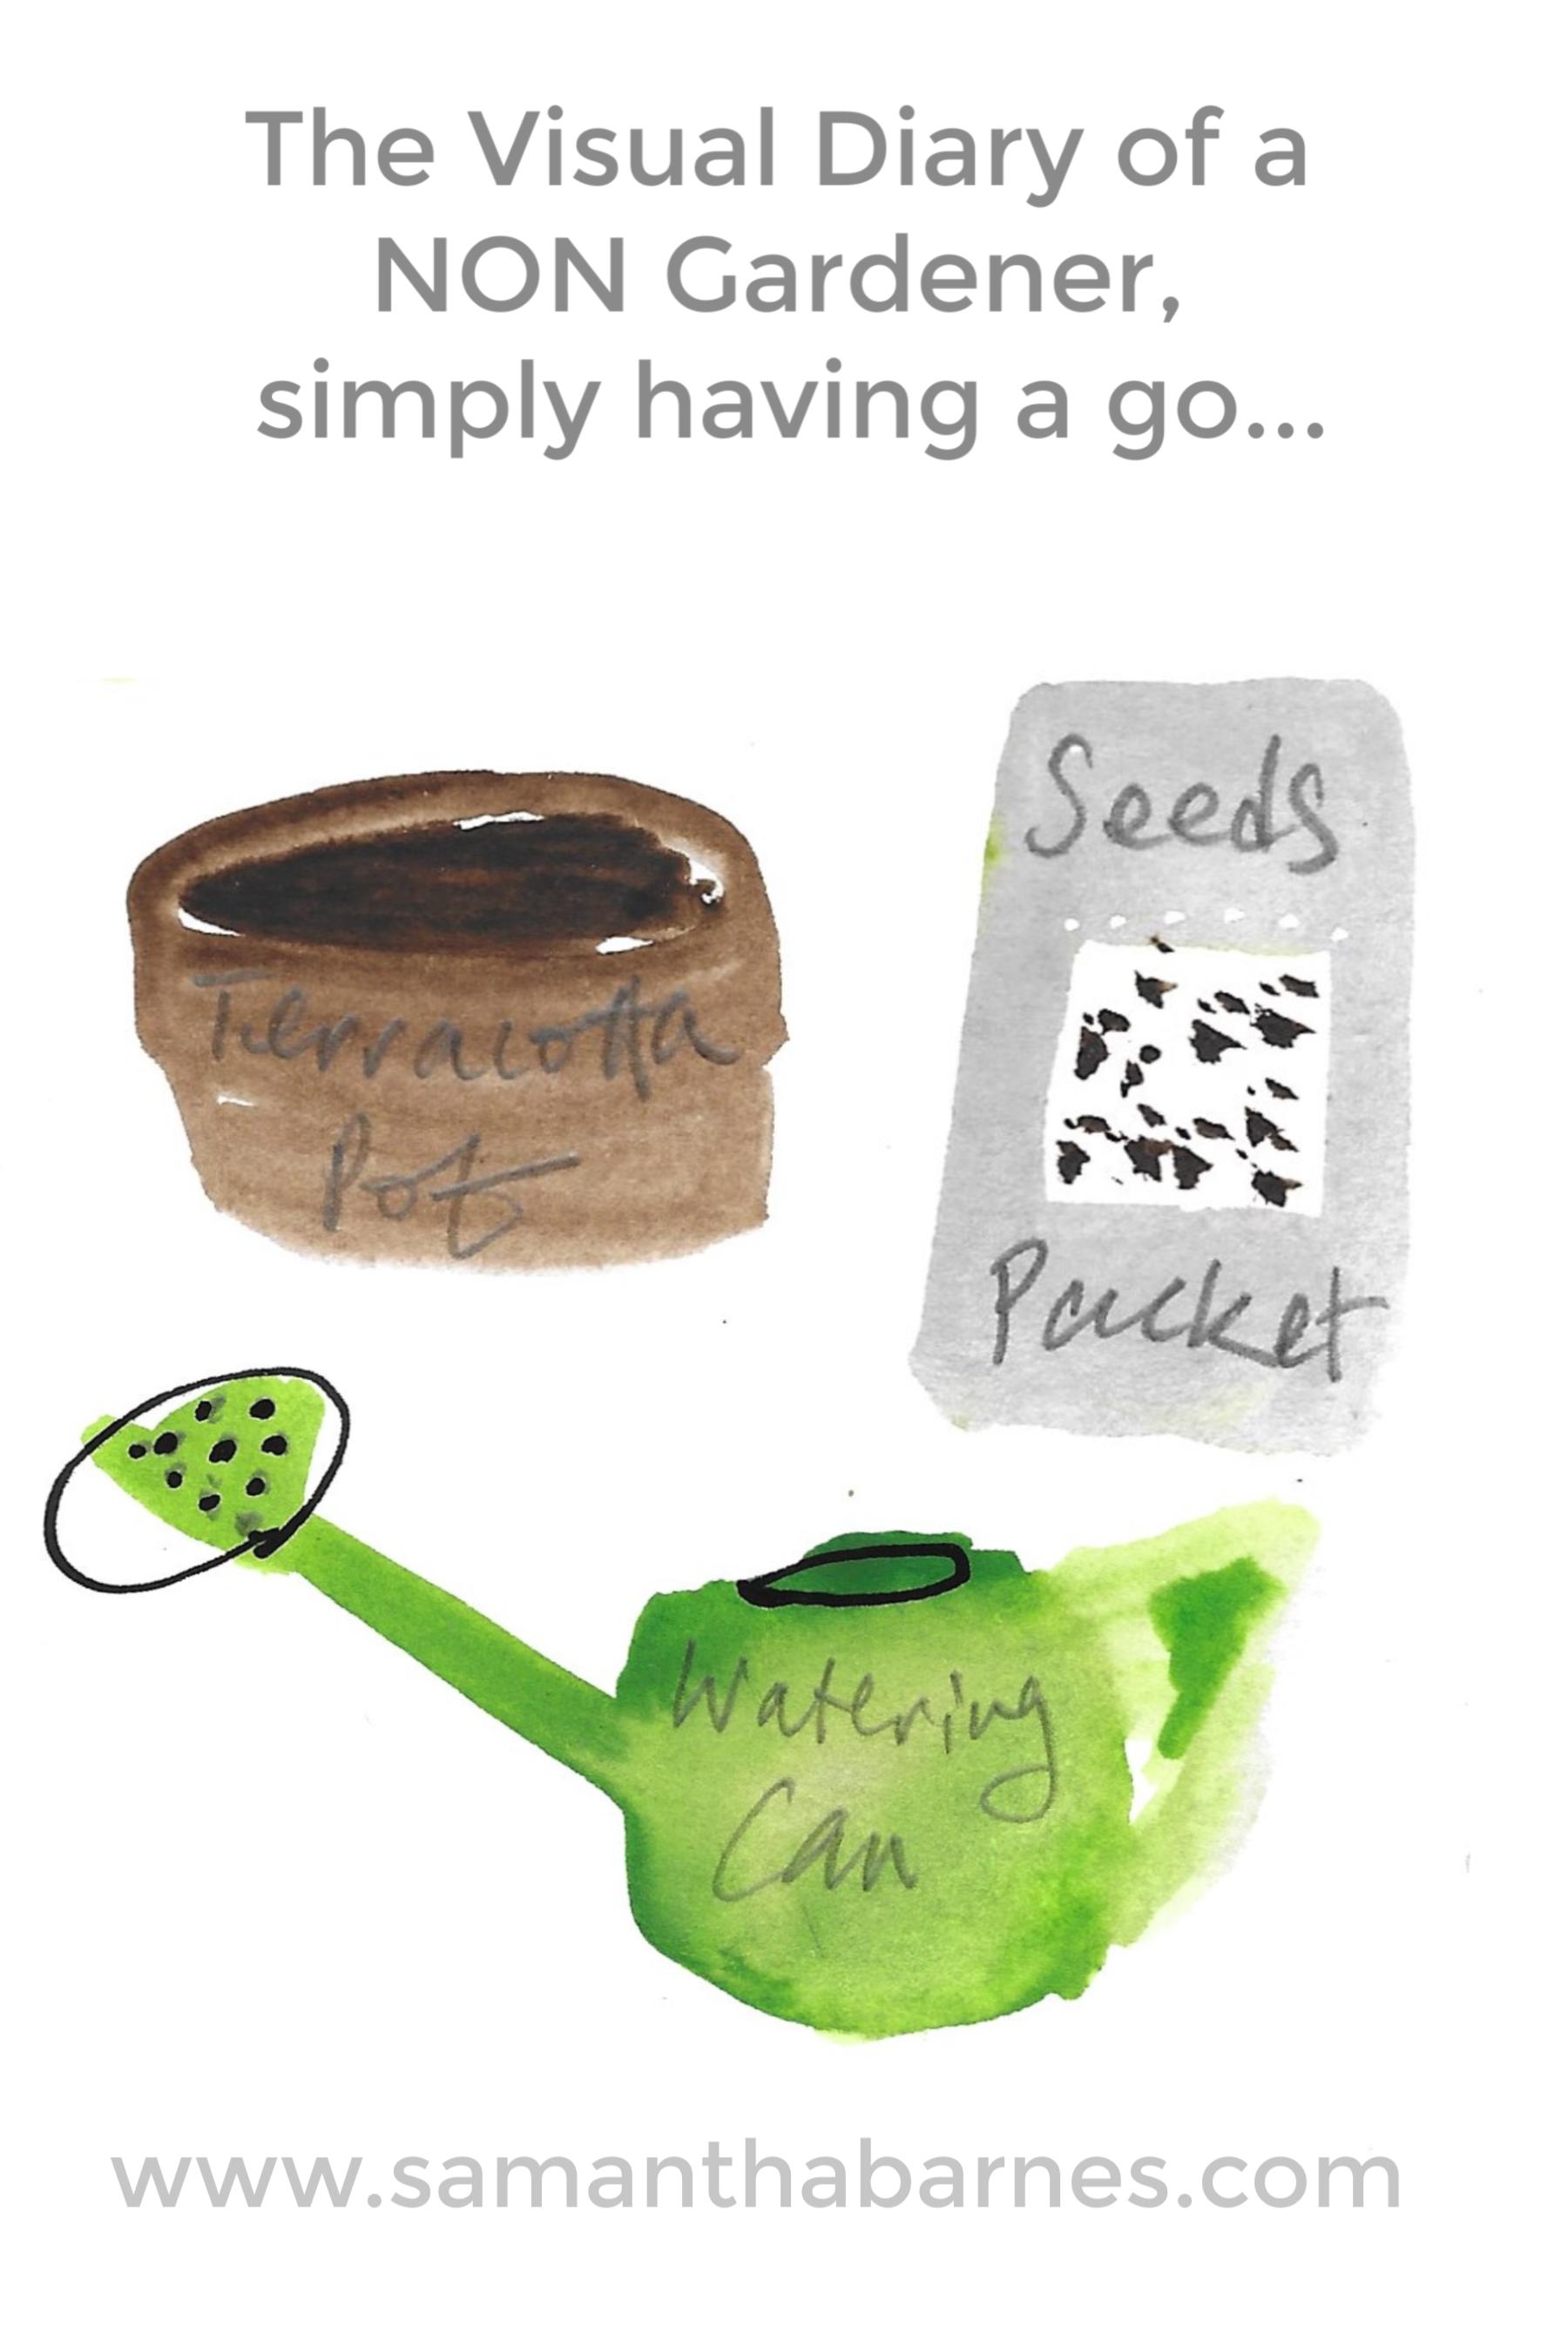 The Visual Diary of a NON Gardener, simply having a go.  Samantha Barnes Artist